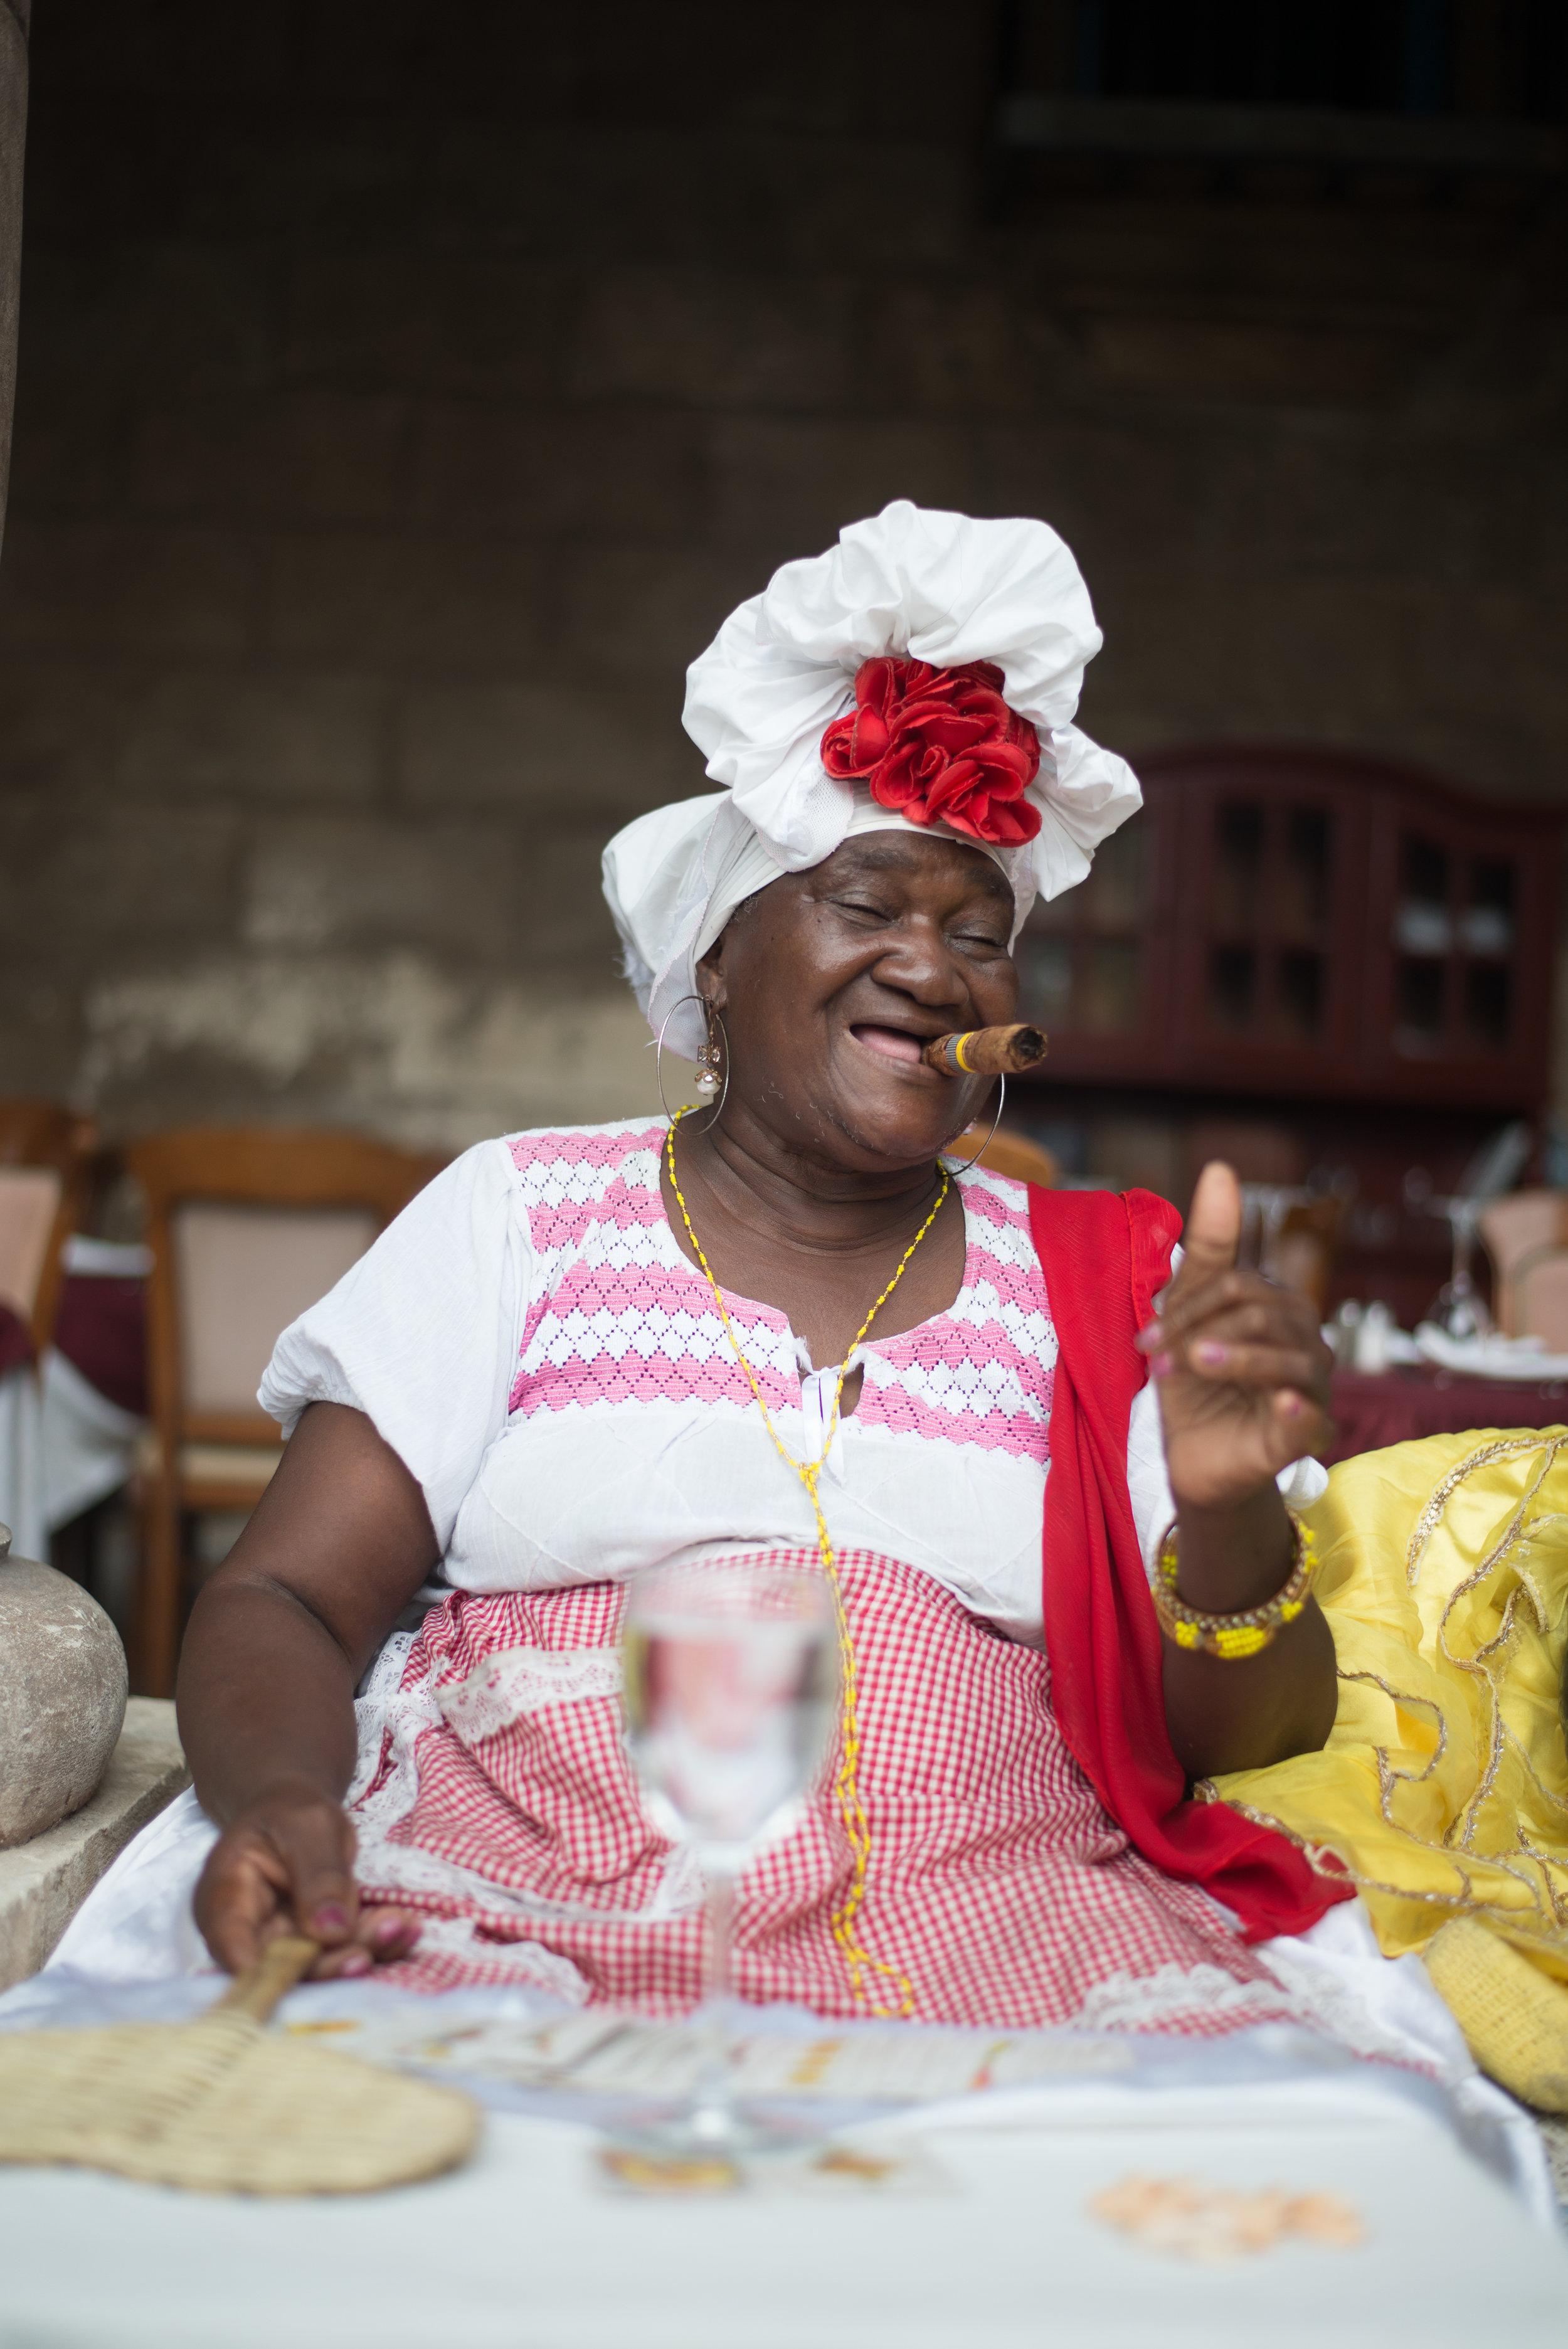 Thumbs Up, Cuba, 2017